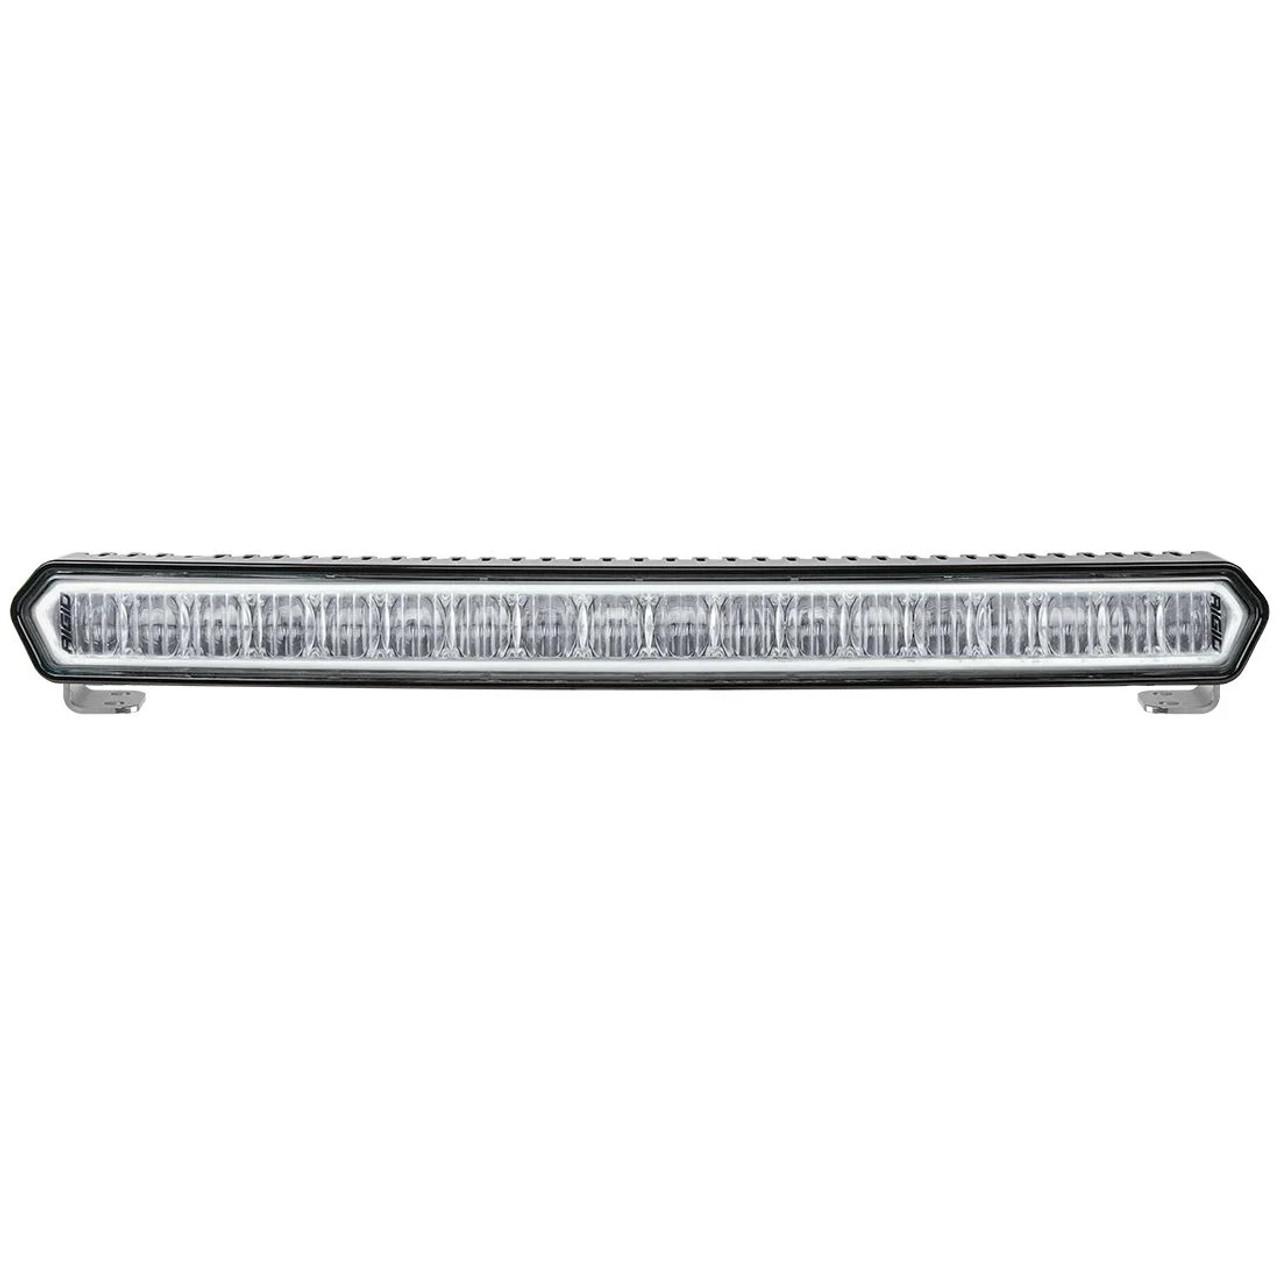 "SR-L Series 20"" Off-Road LED Light Bar Black with White Halo"